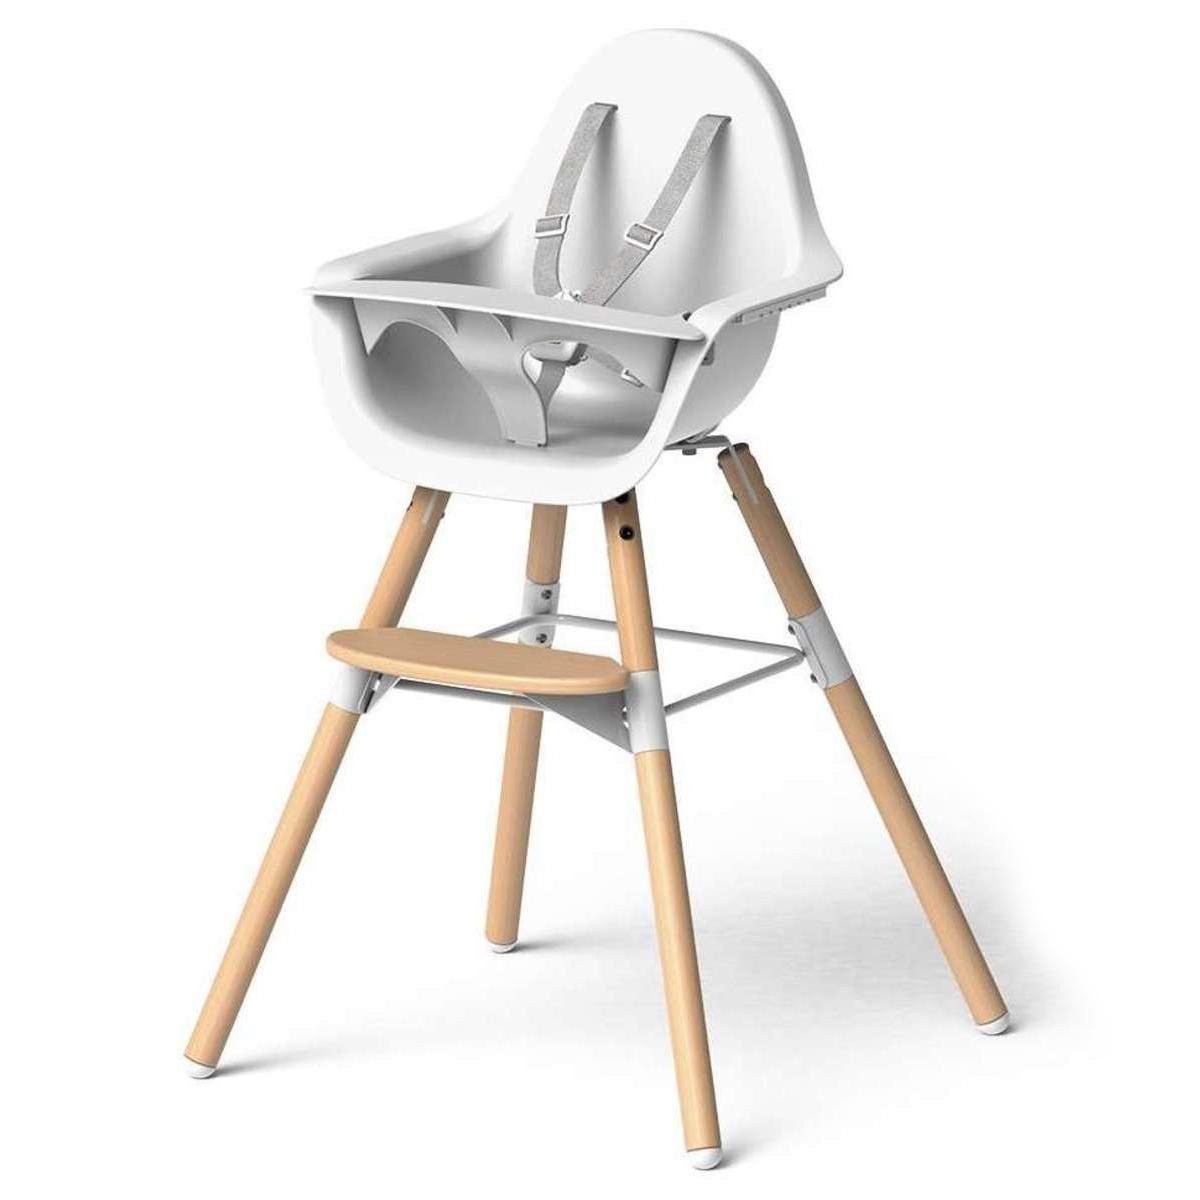 Chaise haute Chaise Haute Evolu 2 Pack Complet - Bois et Blanc Chaise Haute Evolu 2 Pack Complet - Bois et Blanc